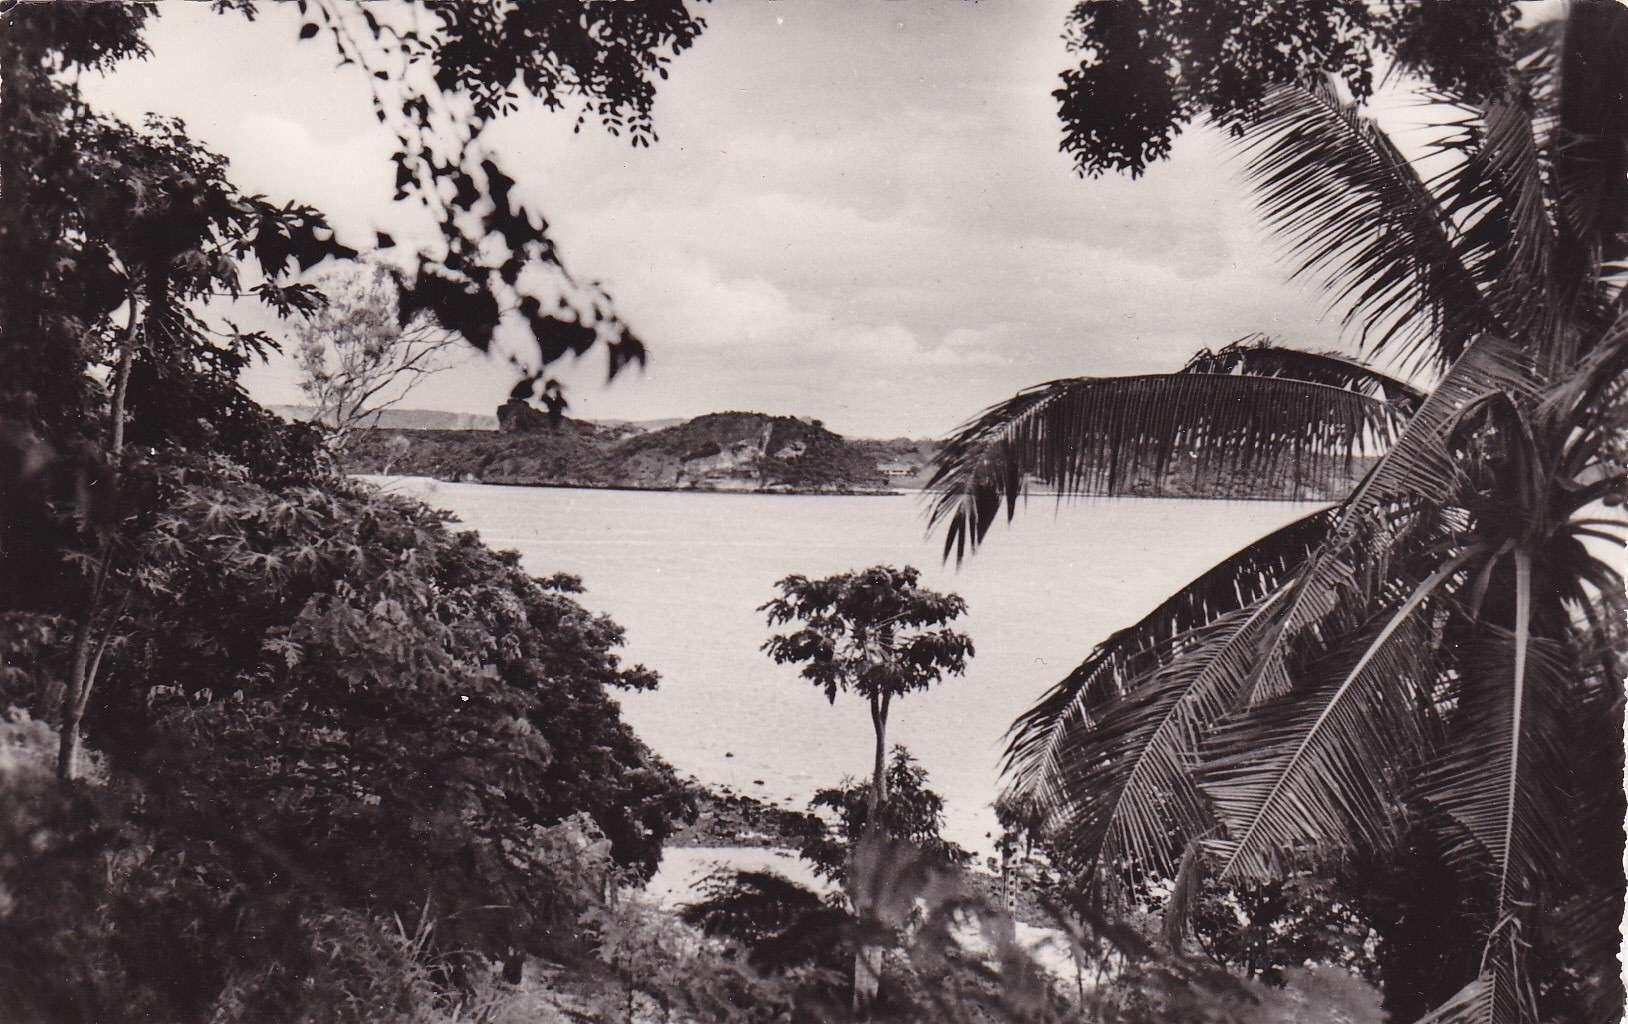 [Divers campagne Madagascar] CAP DIEGO AU CID 1972 - Page 3 Img_0037